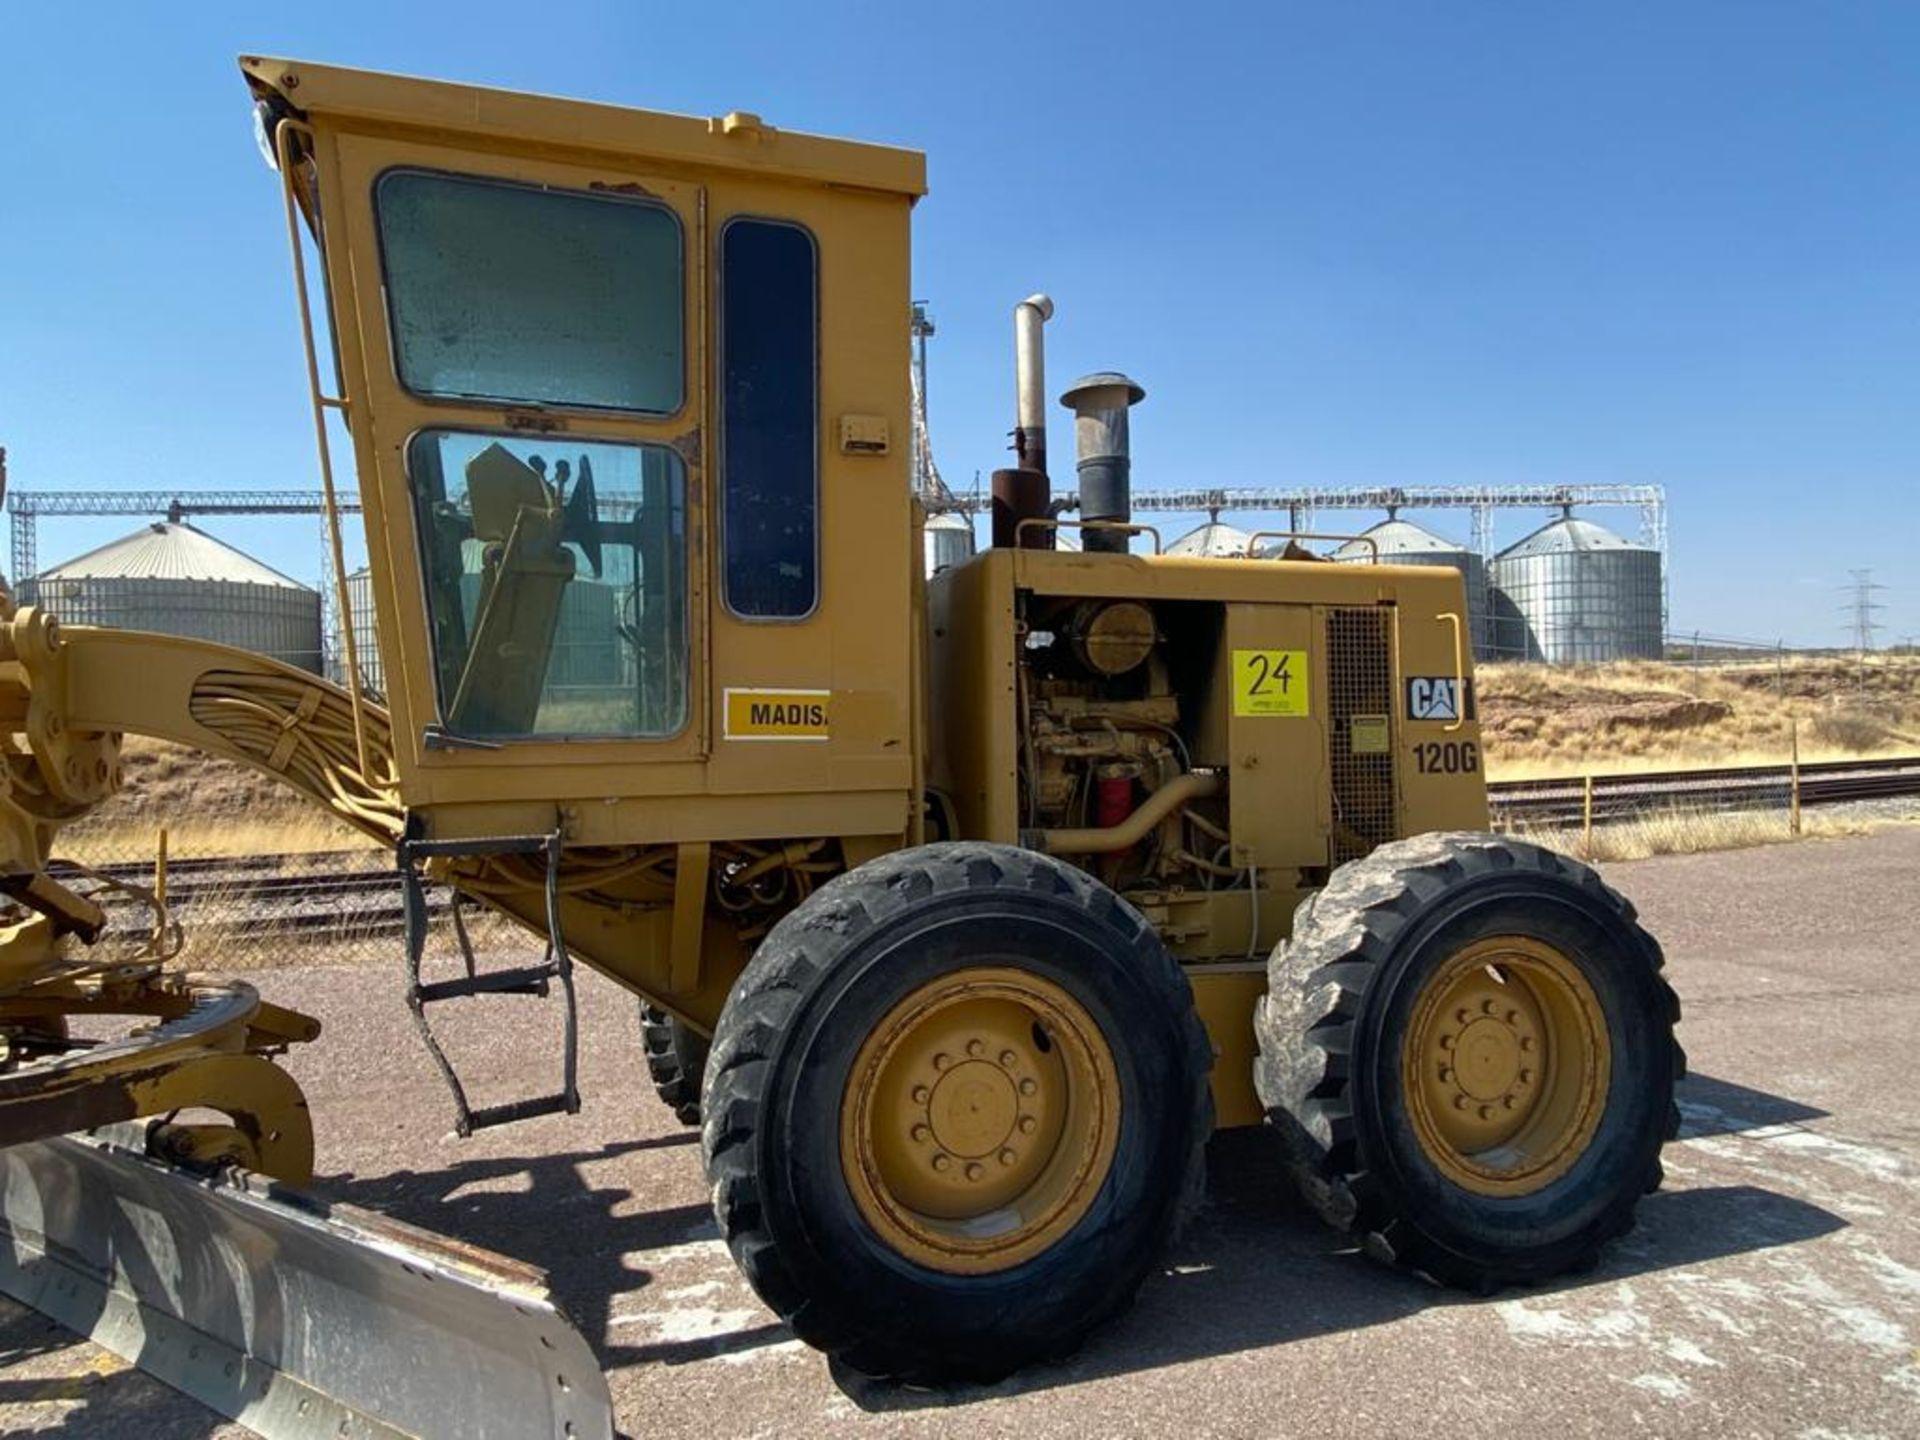 Caterpillar 120G Motor Grader, Serial number 87V09646, Motor number PQ883-2/07Z28983 - Image 13 of 61